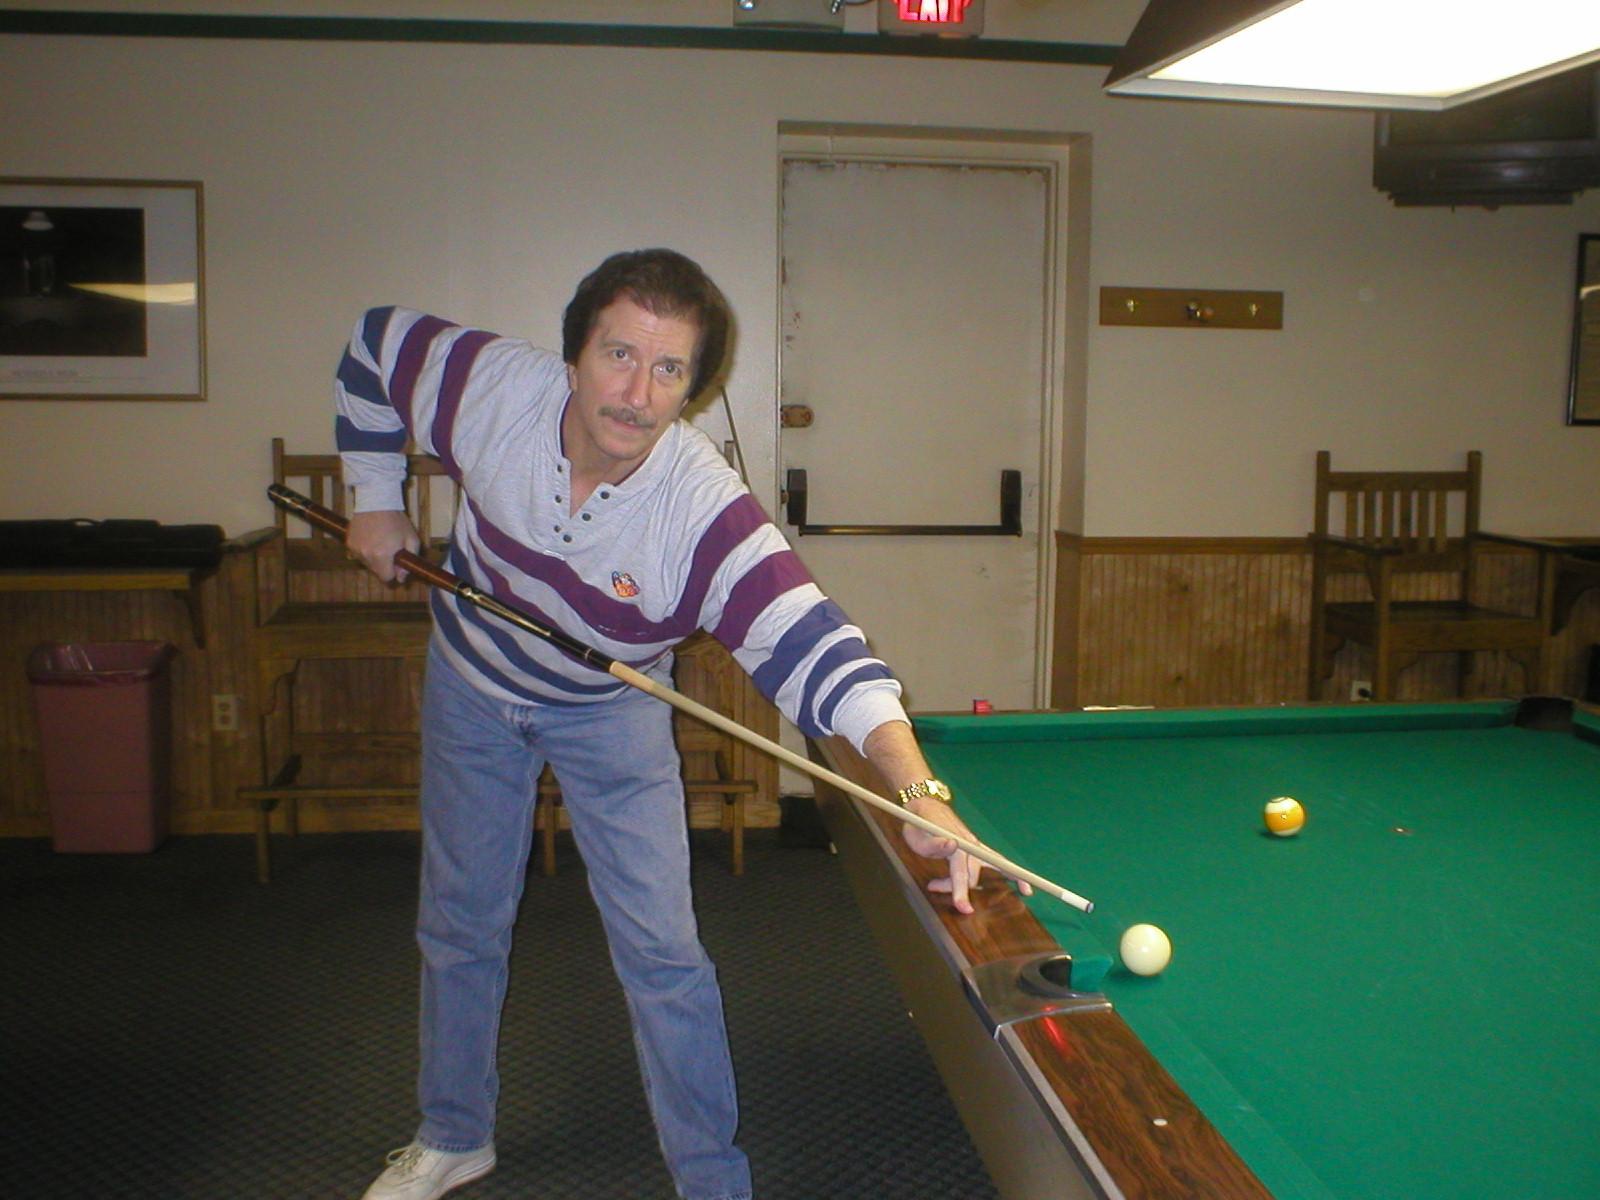 Pool player photos 62